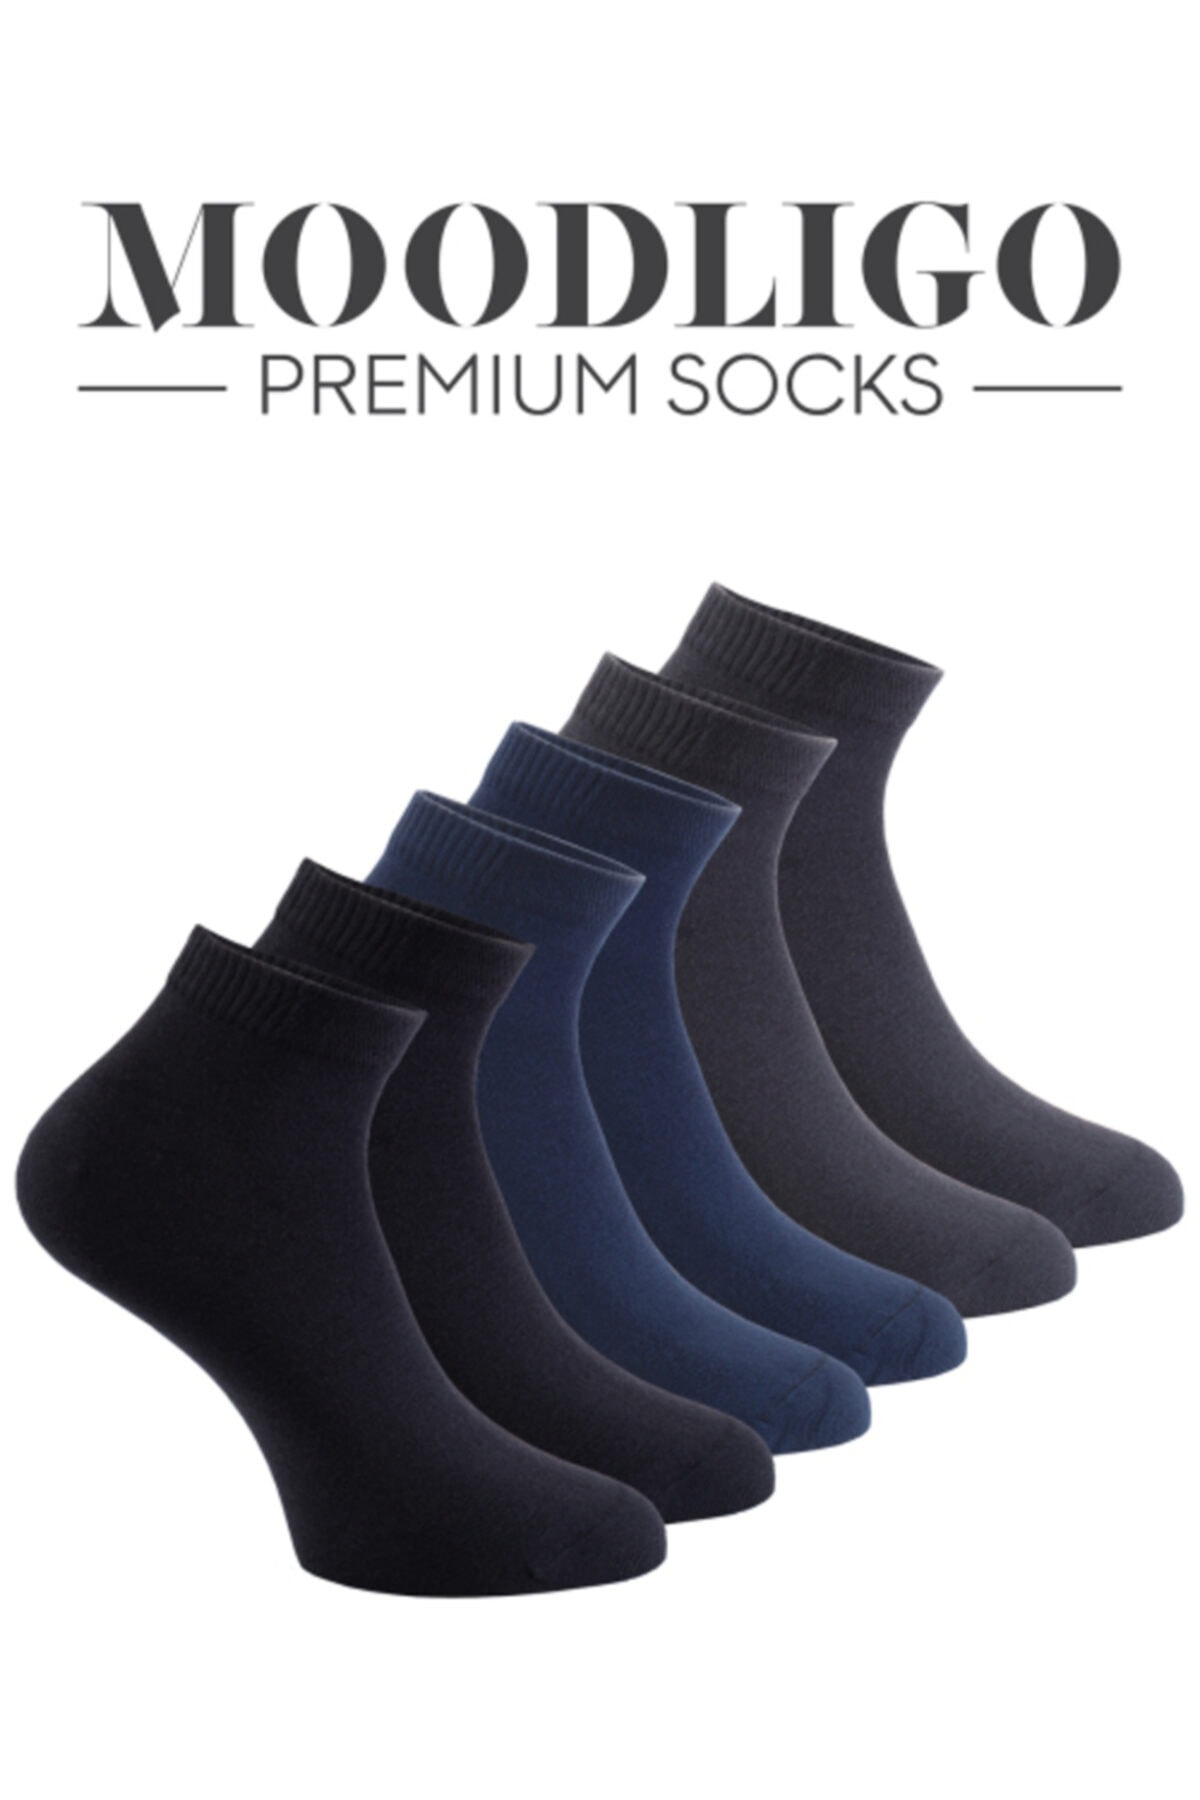 Moodligo Premium 6'lı Bambu Patik Erkek Çorap 2 Siyah 2 Füme 2 Lacivert 2